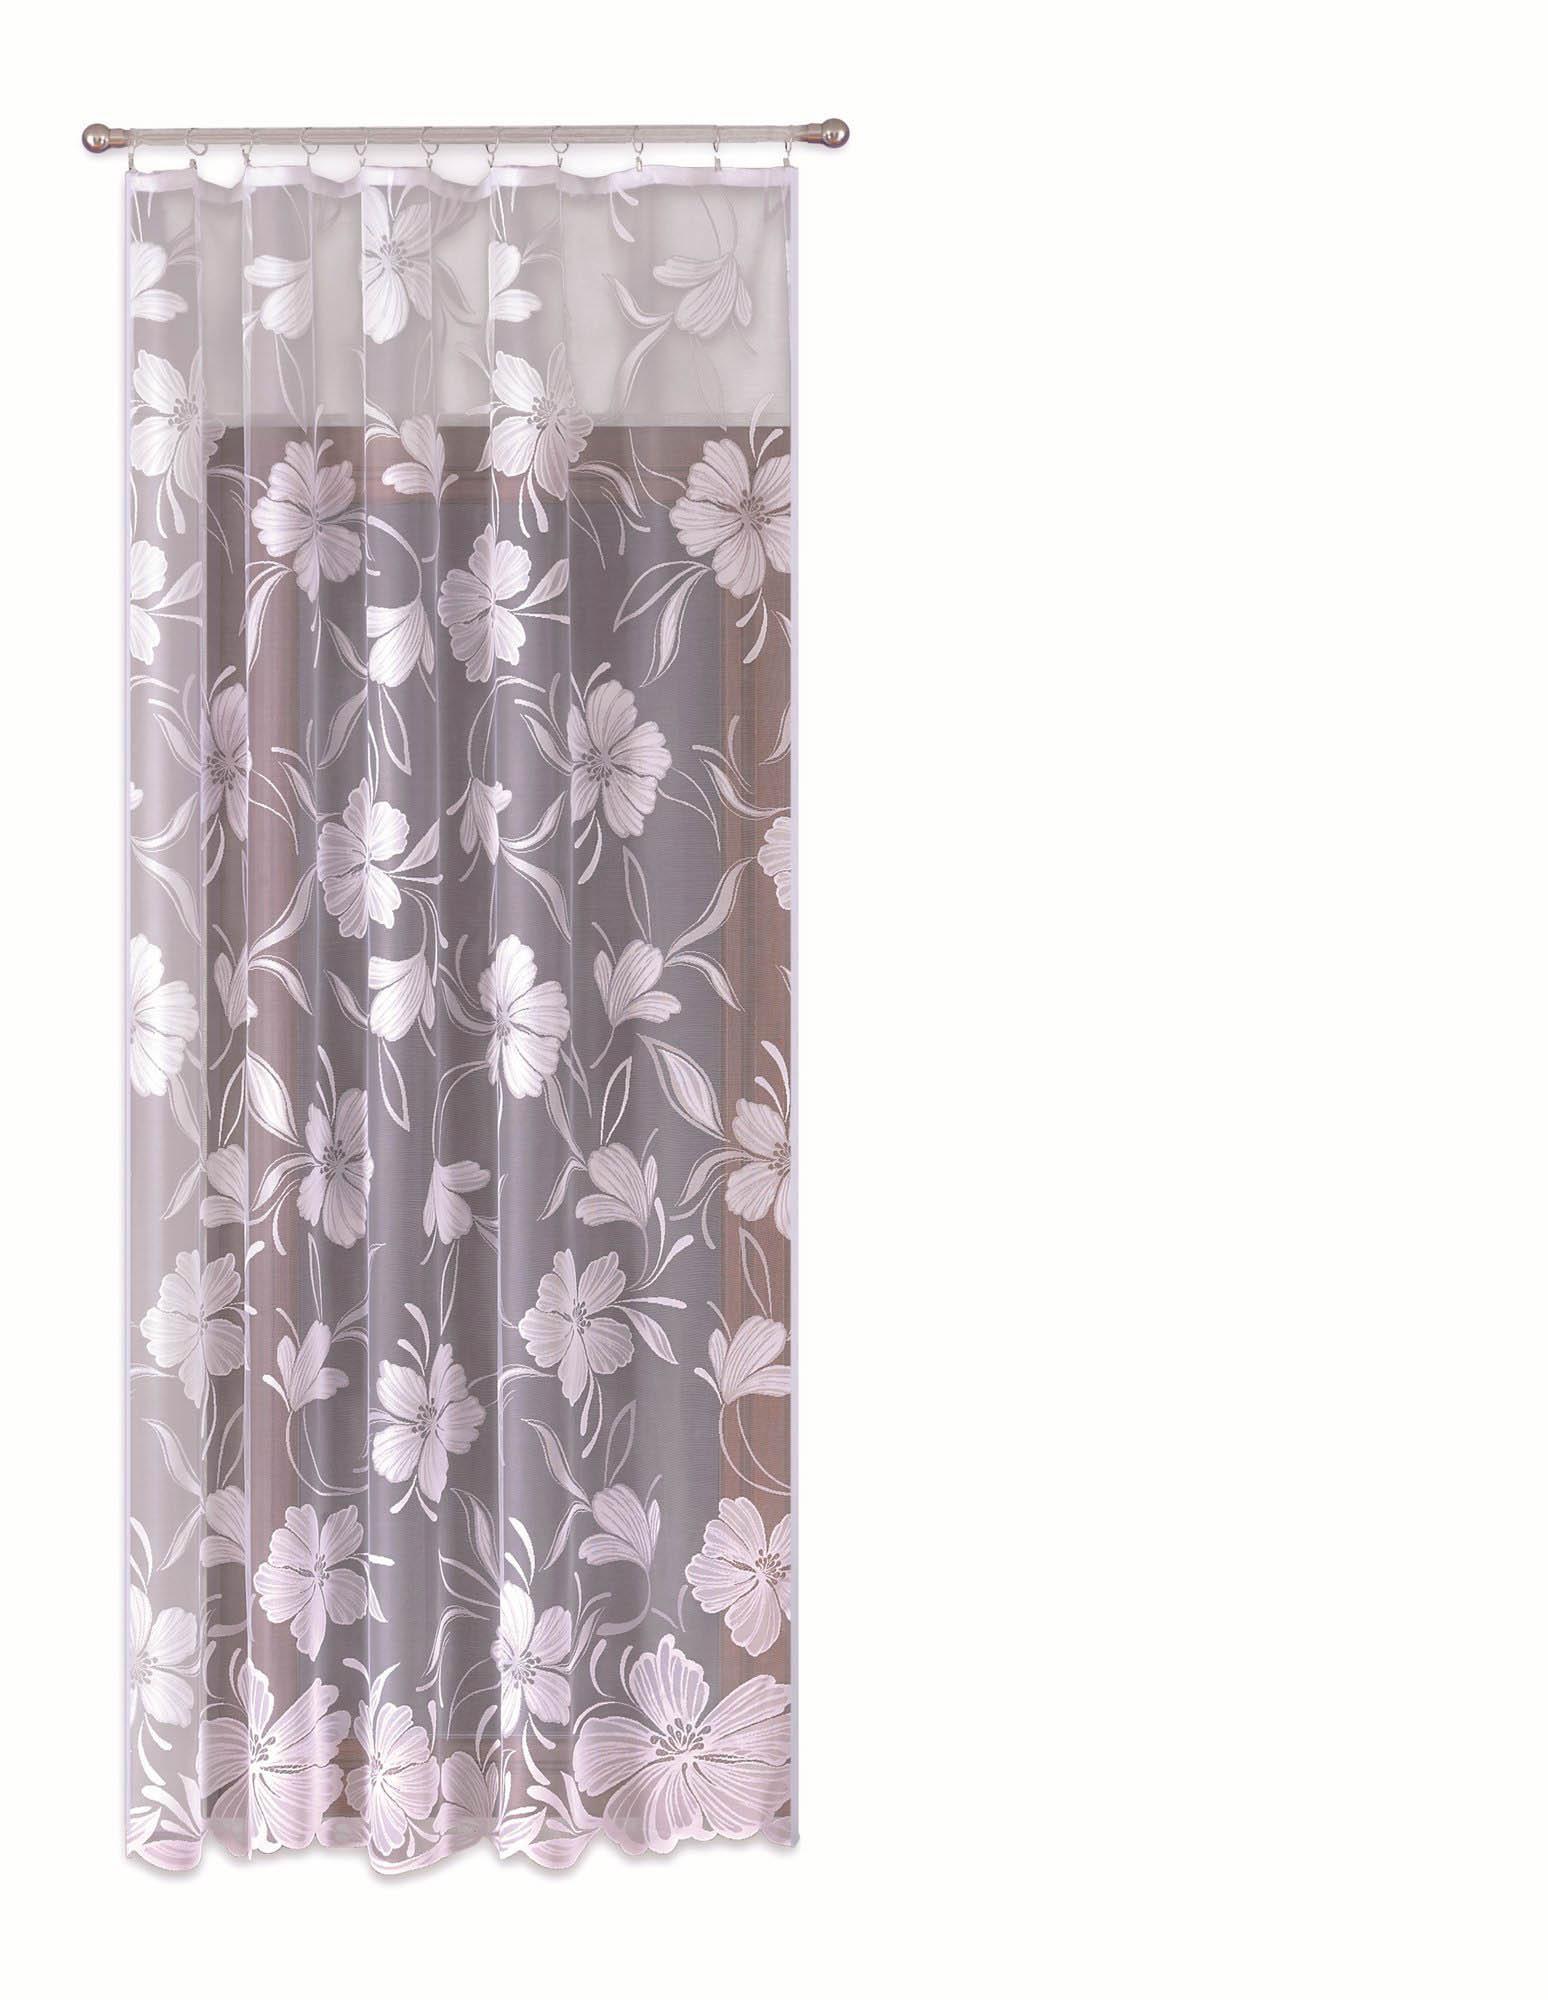 Шторы Primavera Классические шторы Elly Цвет: Белый шторы primavera классические шторы tilly цвет серый